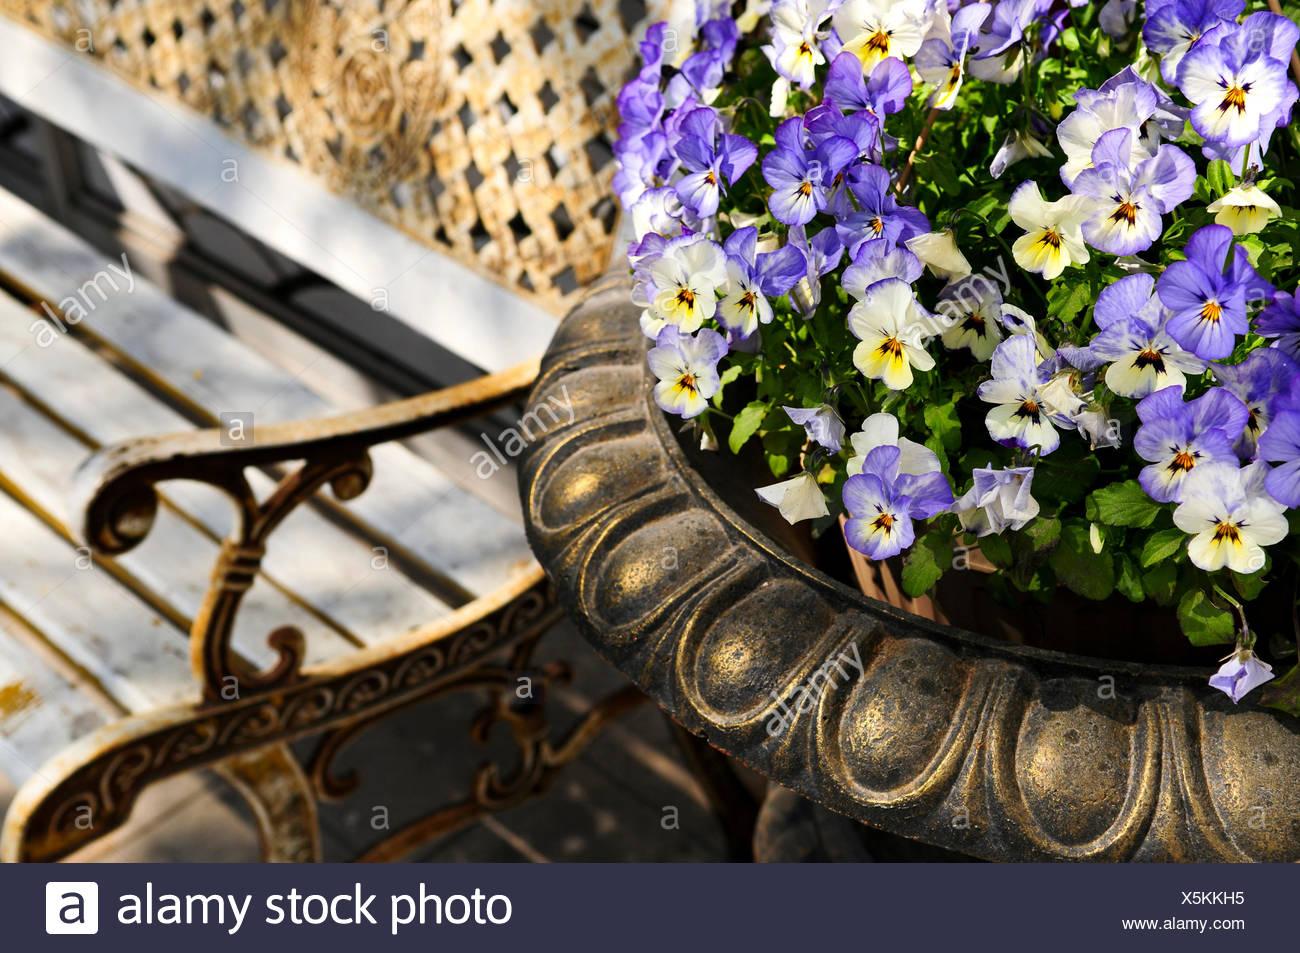 Groovy Garden Flower Flowers Plant Purple Seat Bench Blooming Park Machost Co Dining Chair Design Ideas Machostcouk